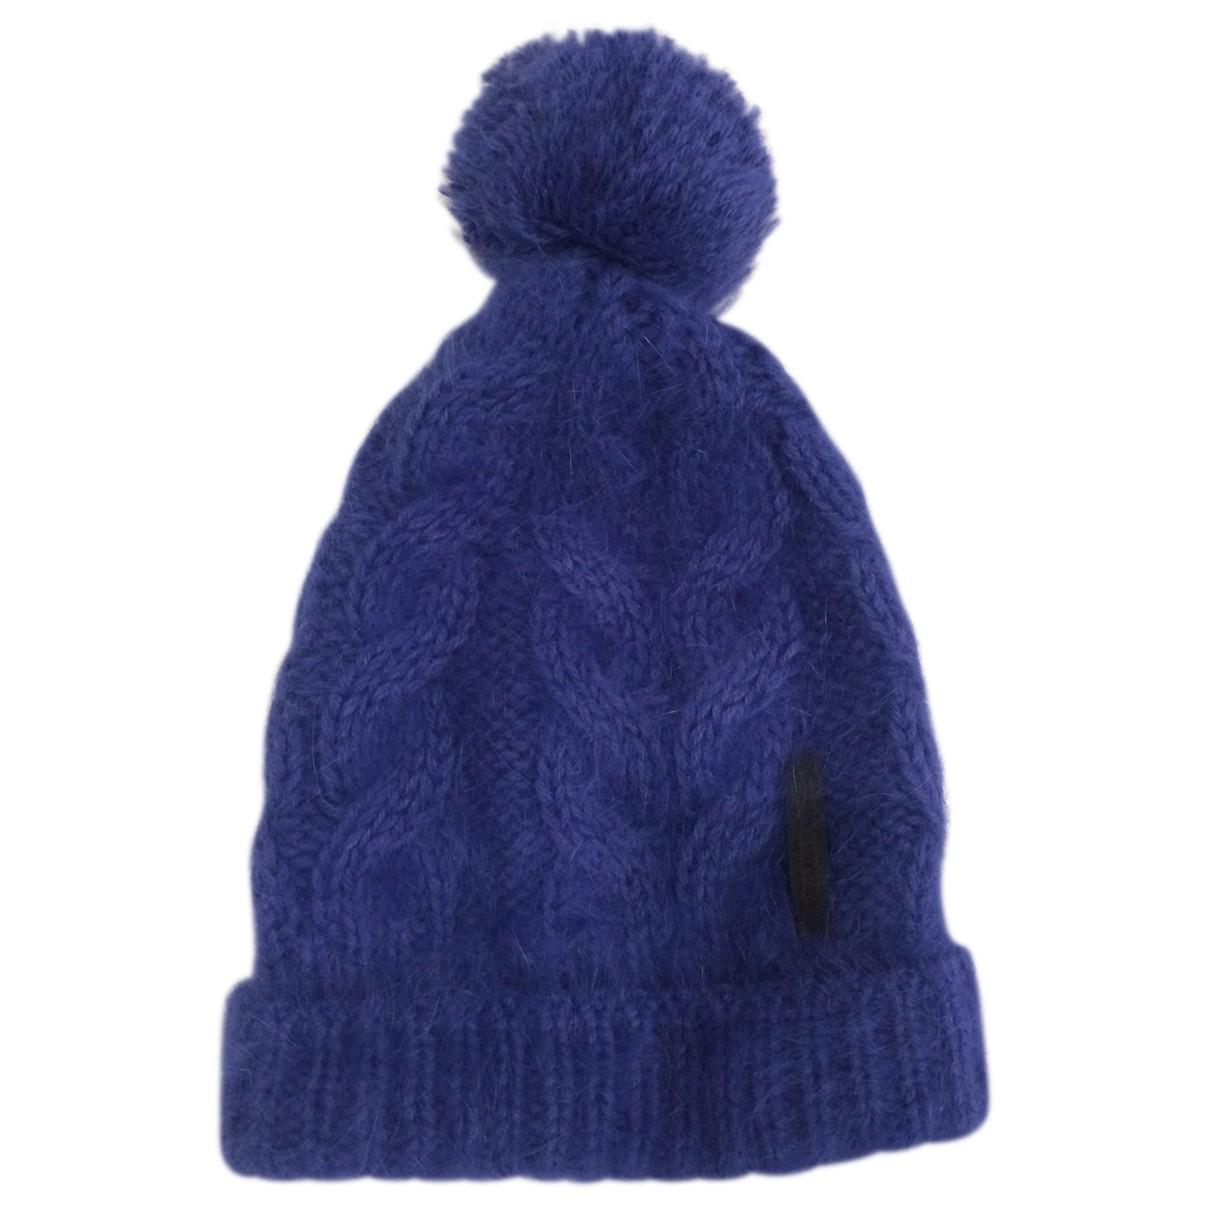 Prada \N Blue Wool hat for Women M International